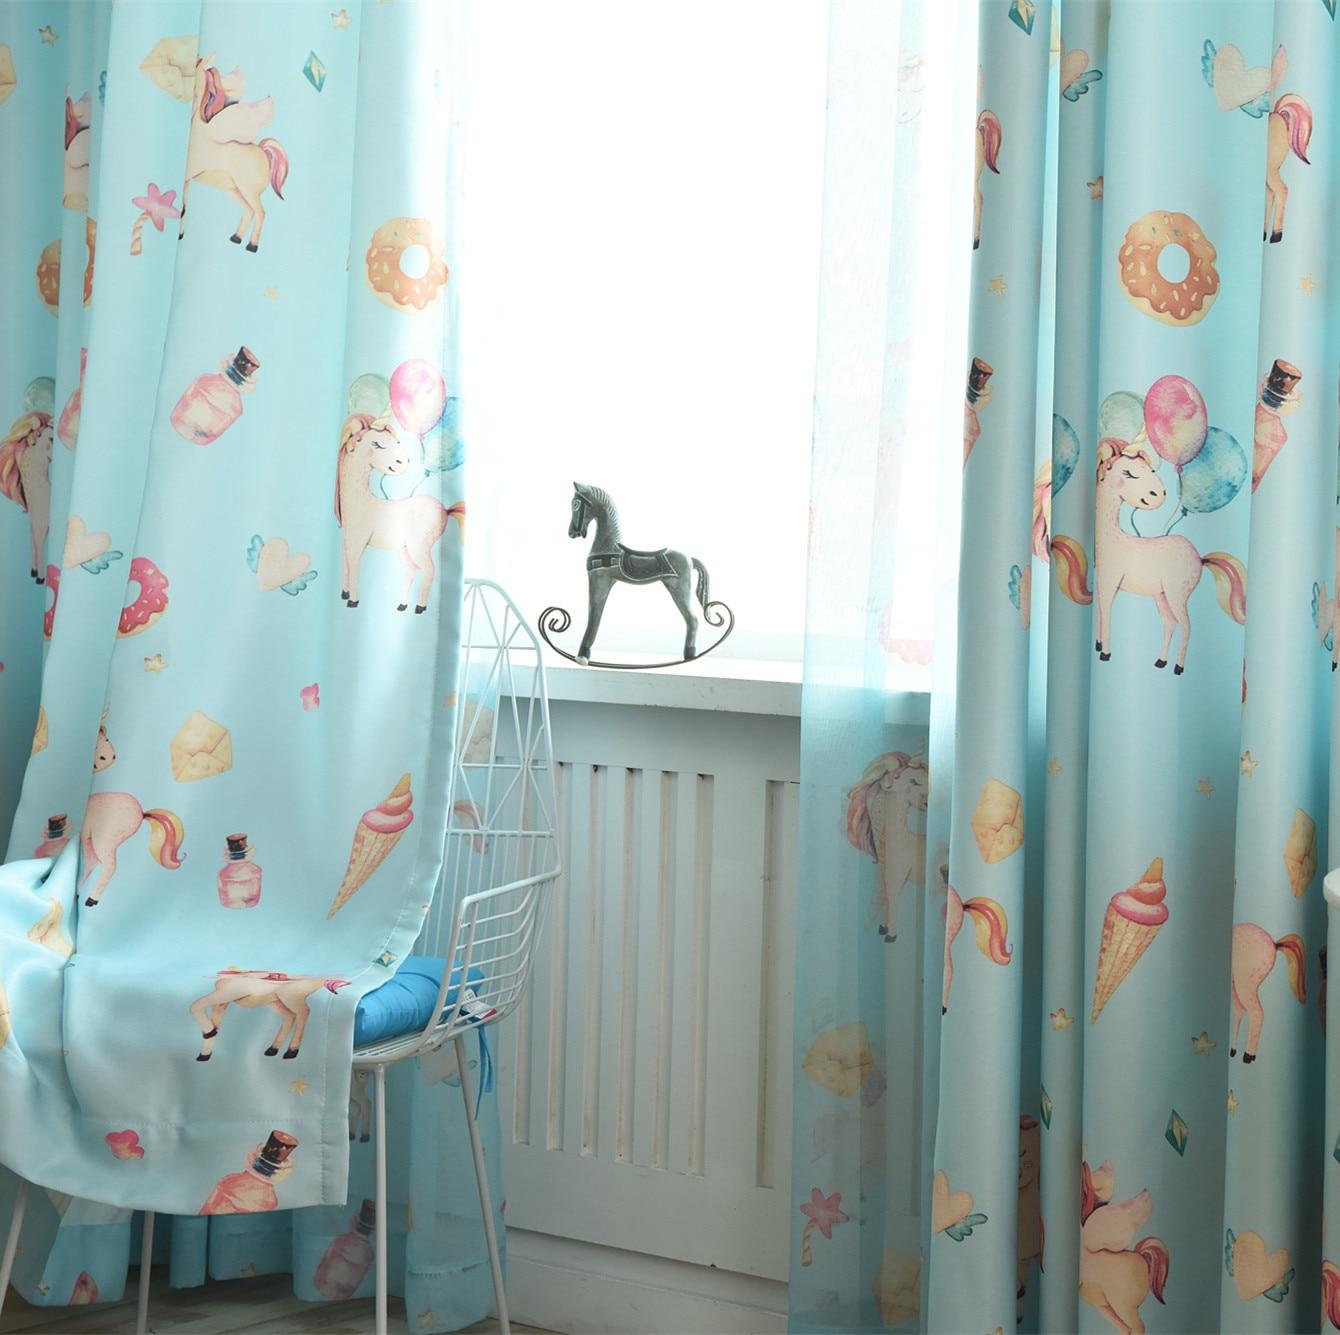 Korean Children's Room Bedroom Half Blackout Curtains For